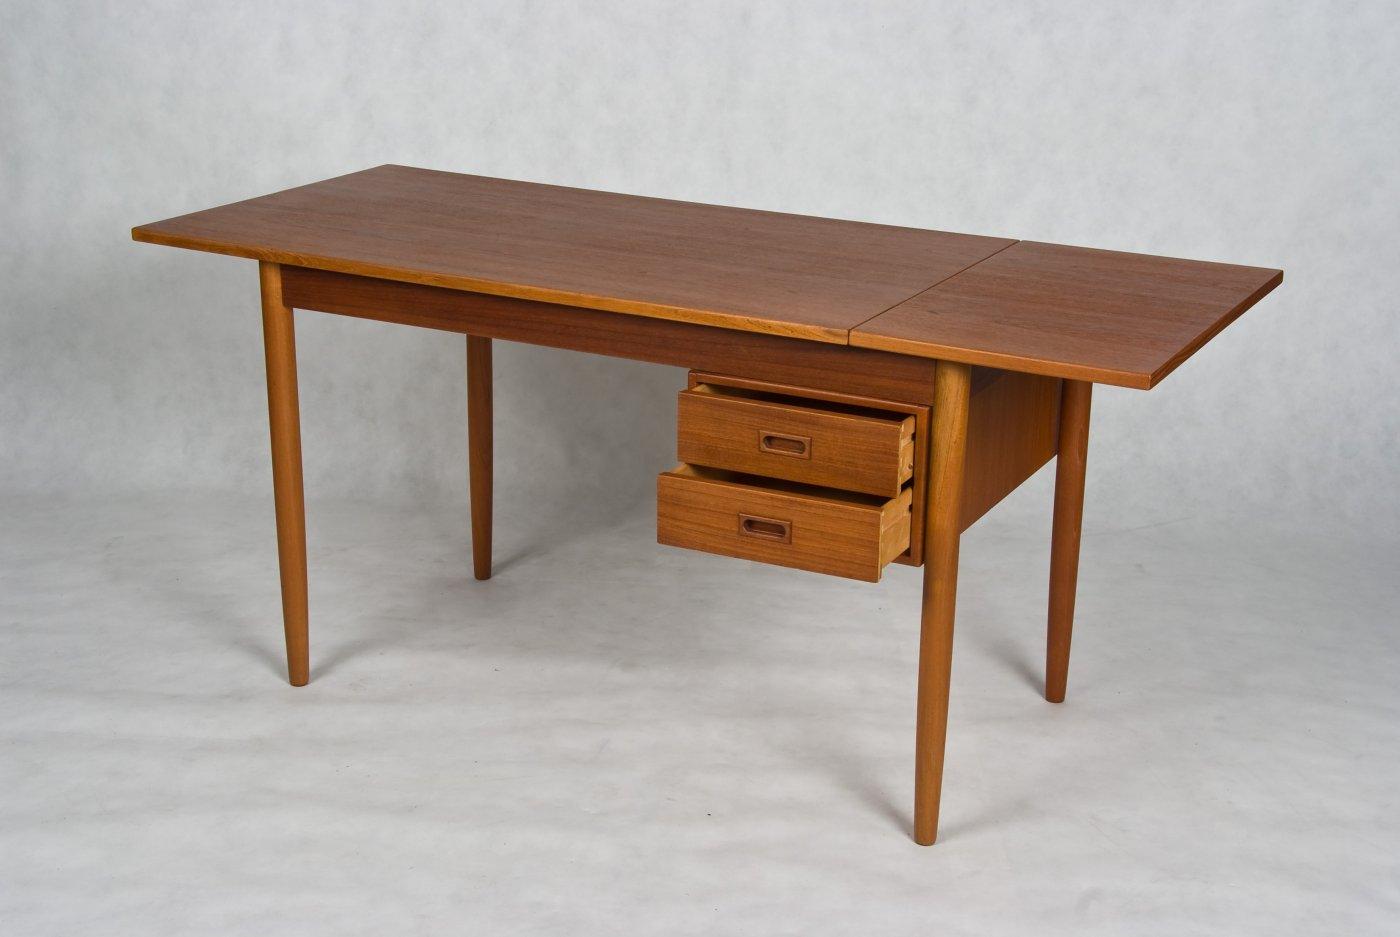 Small Danish vintage desk teak and oak : db29 3 big from bobutik.com.au size 1400 x 937 jpeg 103kB